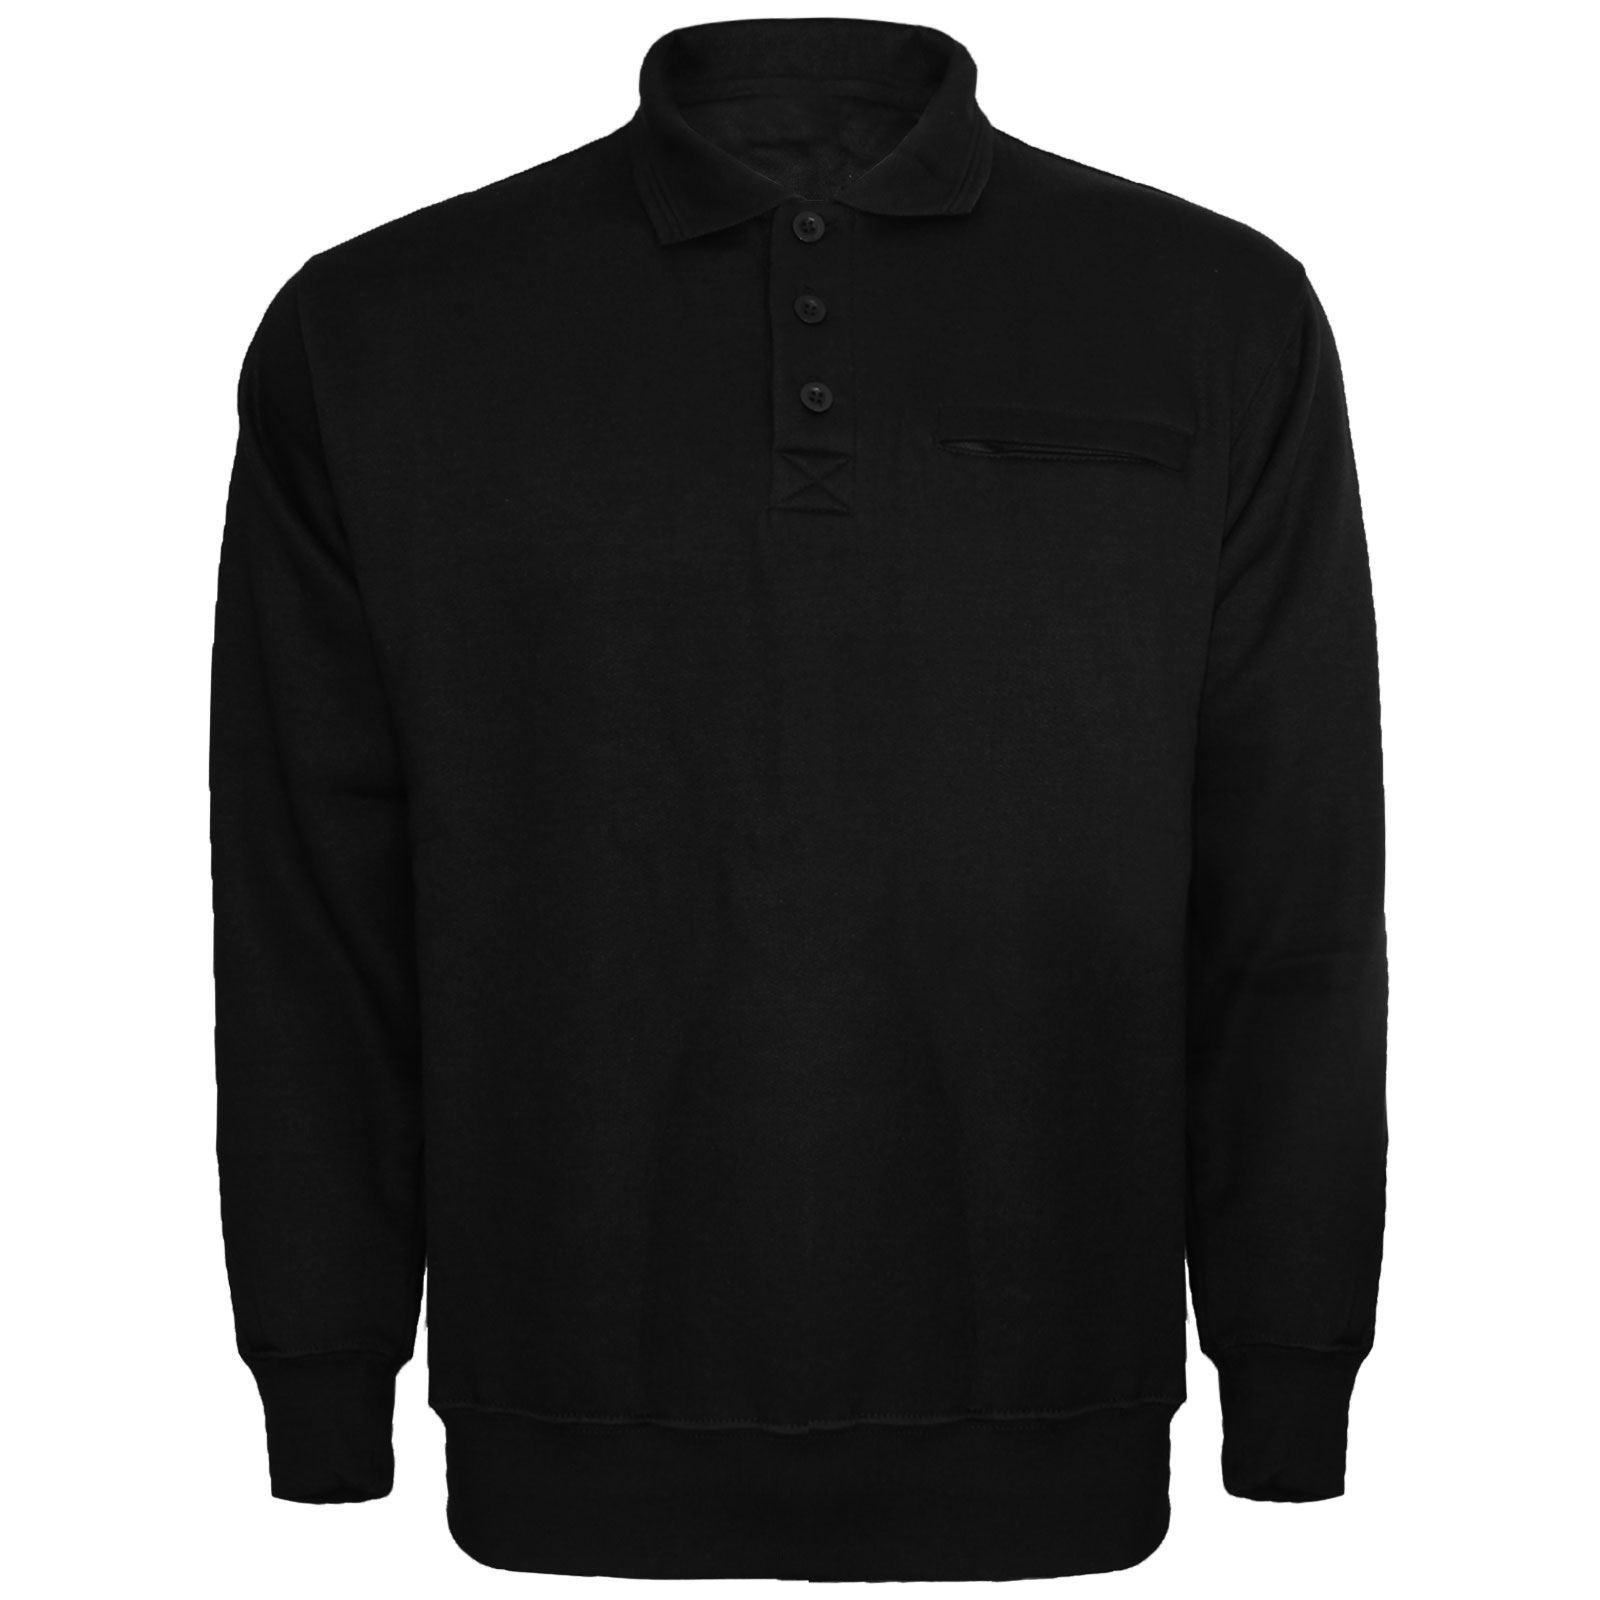 Plain black t shirt xxl - New Mens Plain Polo Sweatshirt Jumper Button Collared